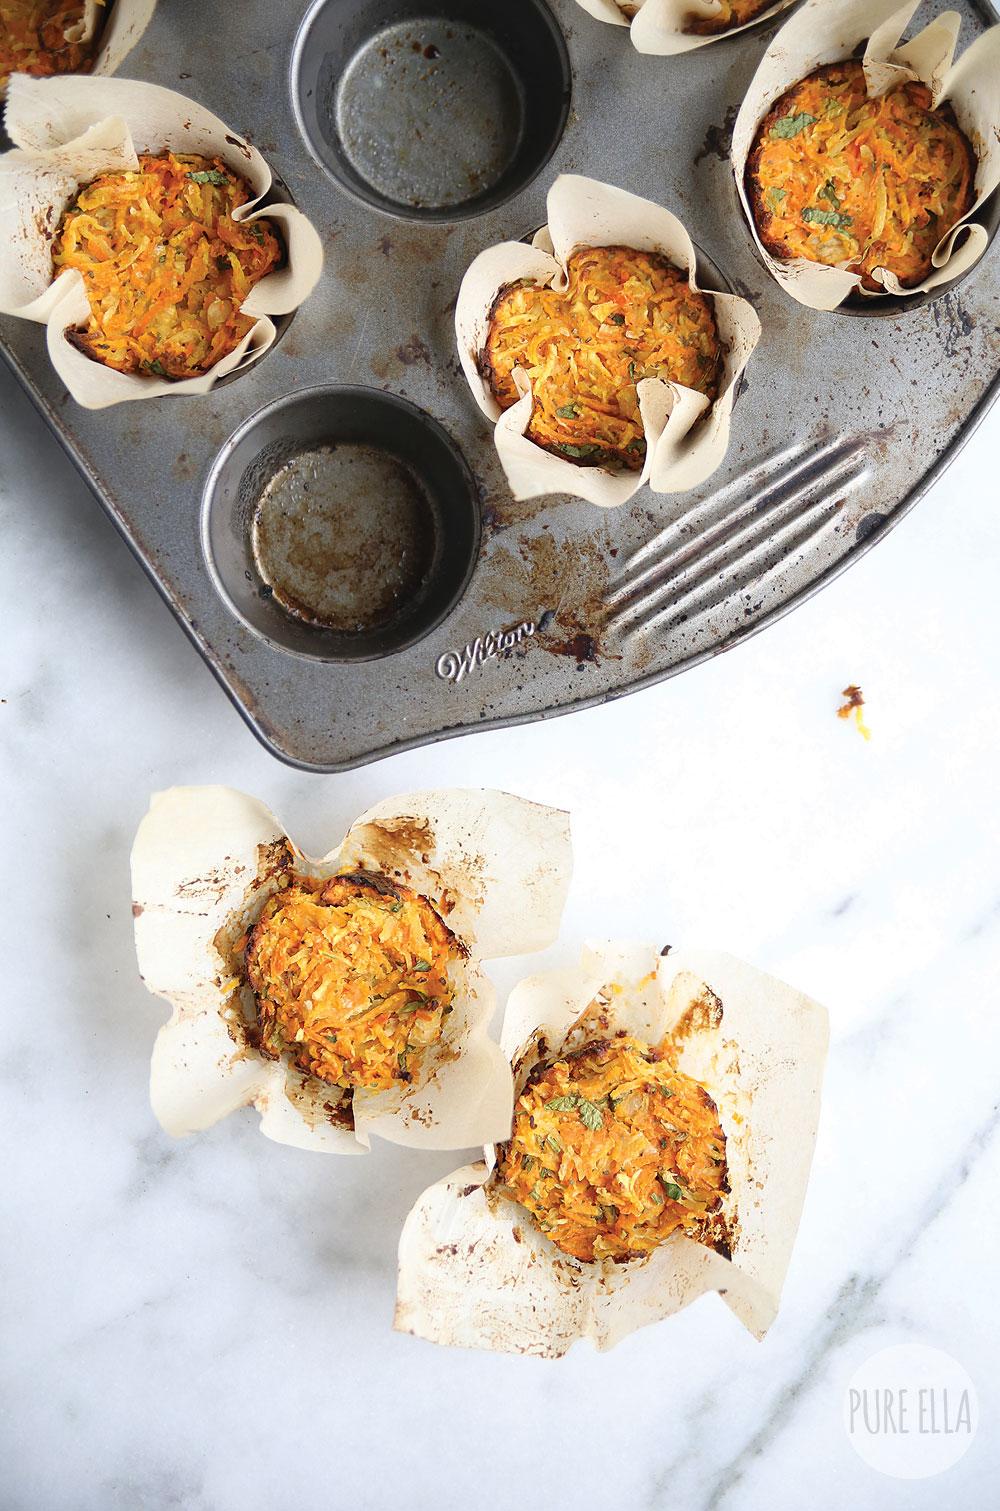 Pure-Ella-Gluten-Free-Vegan-Muffins-Savory6